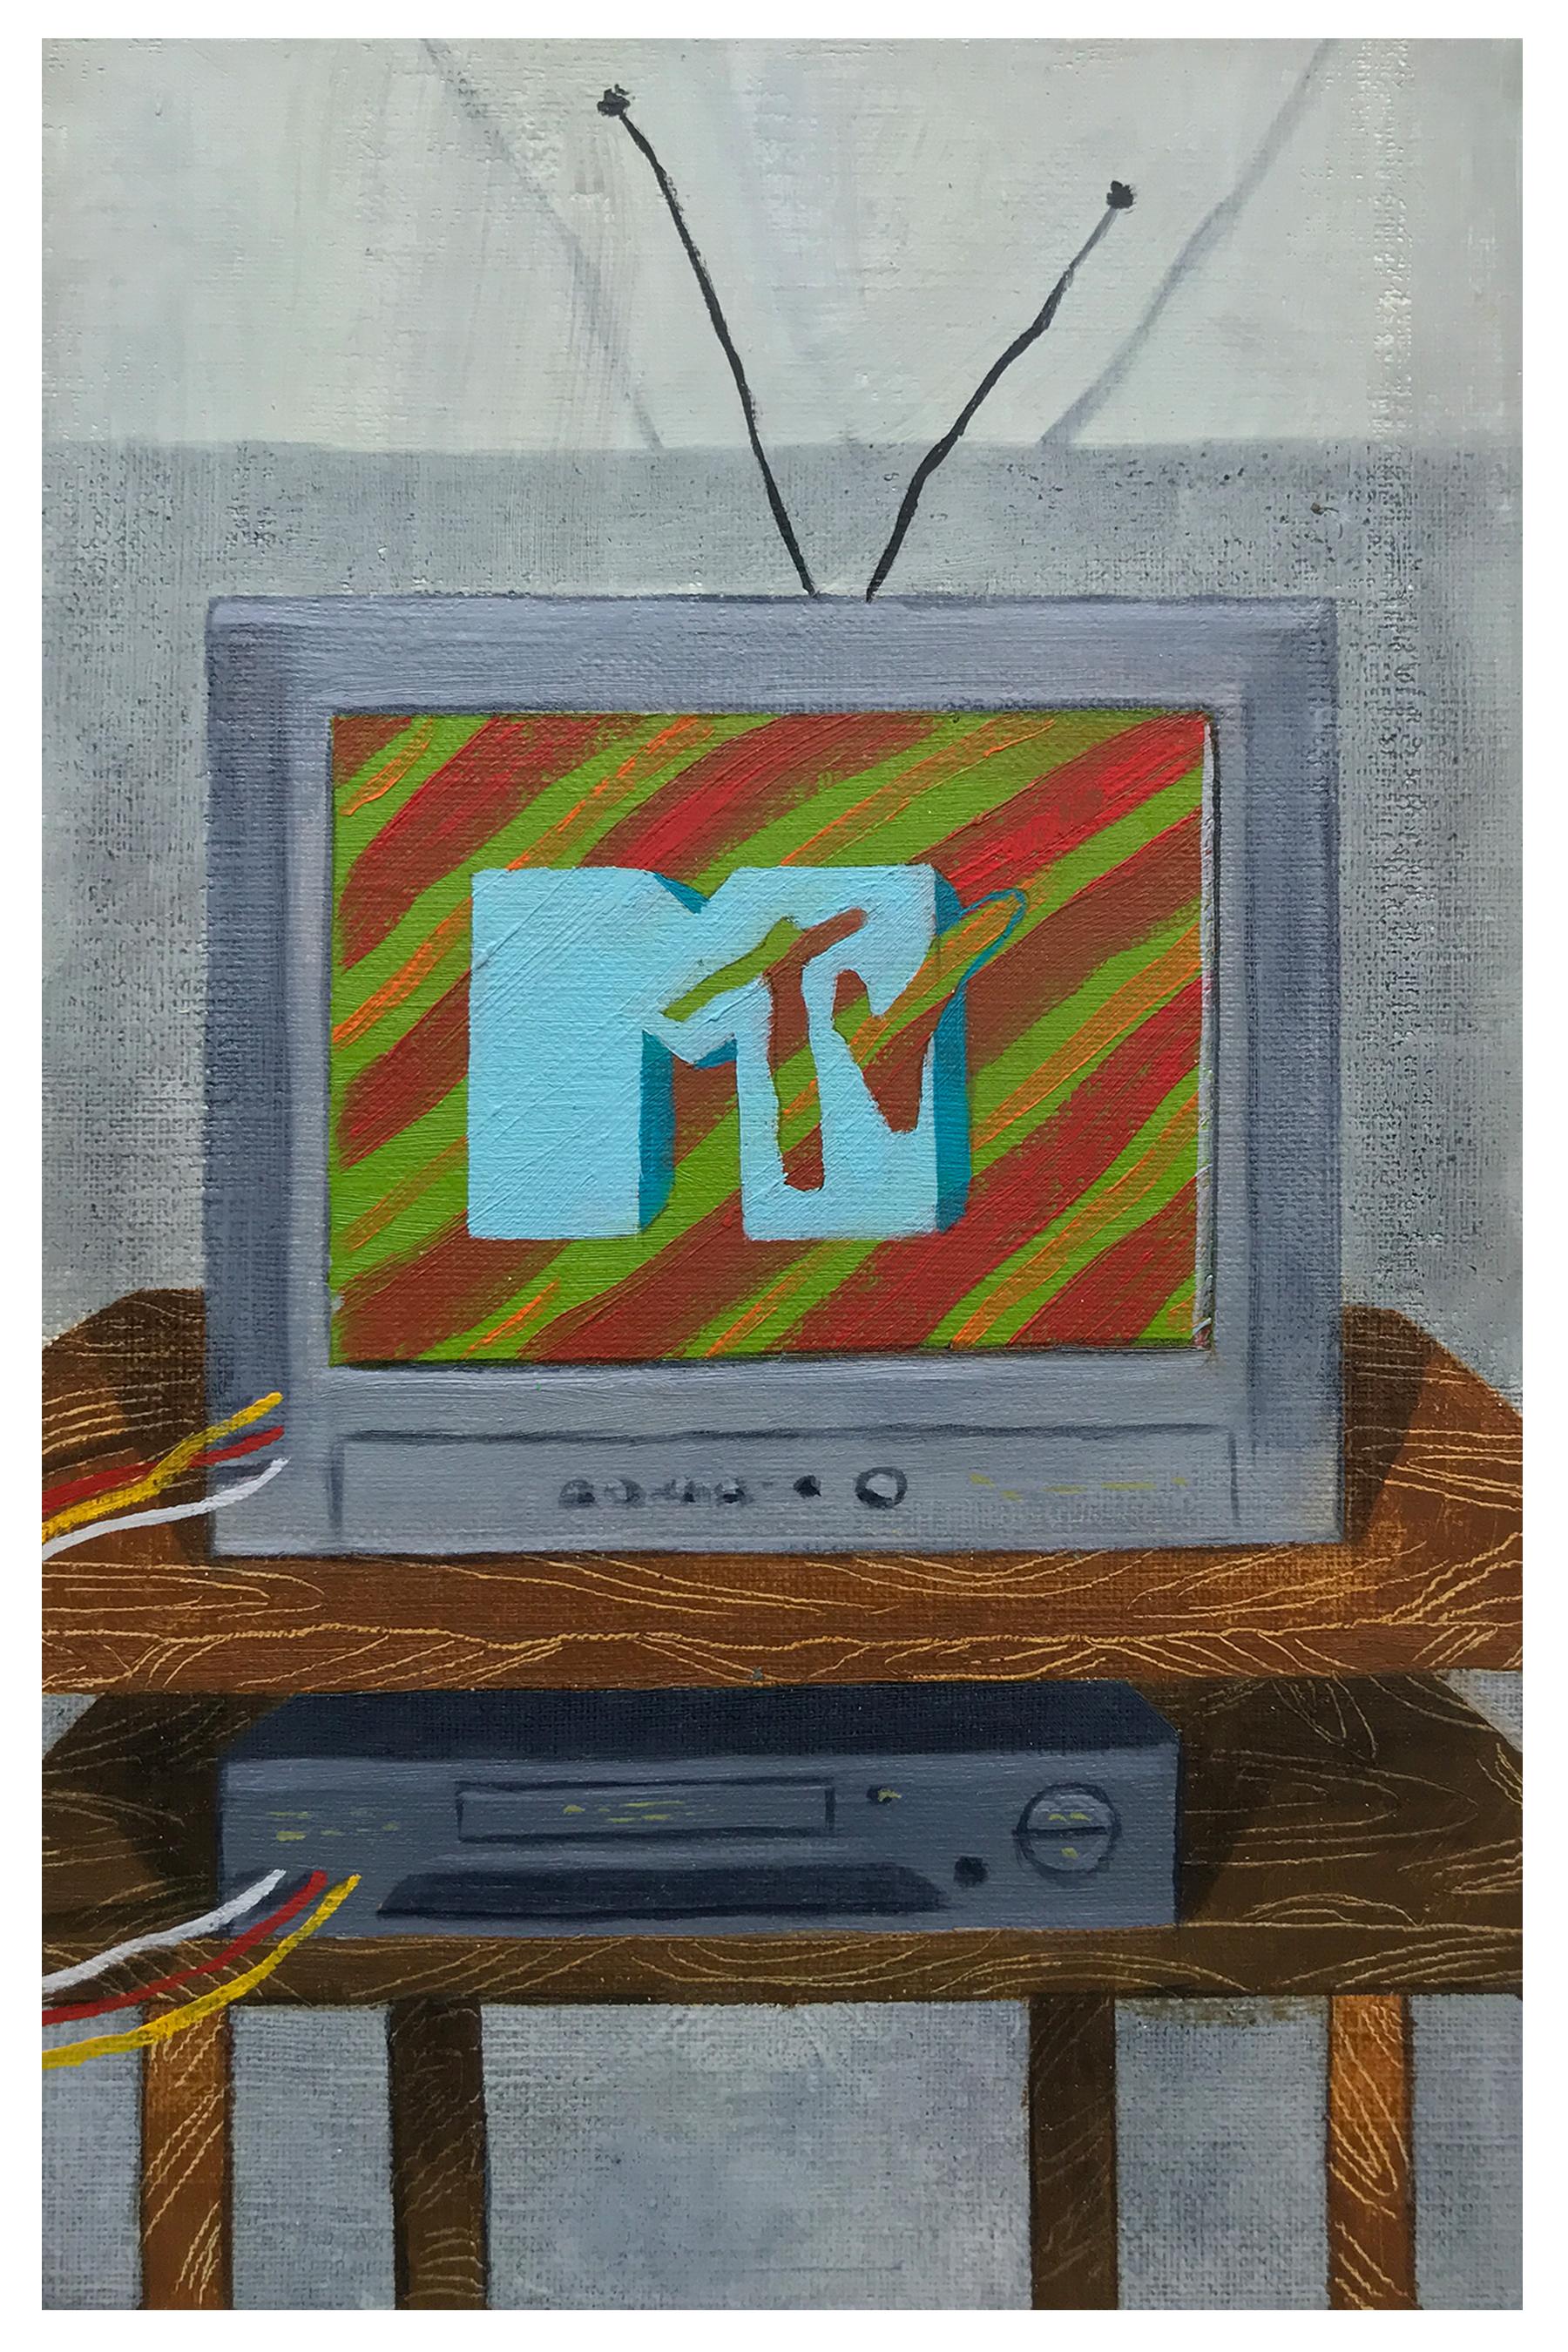 MTV, 9 x 6 in.